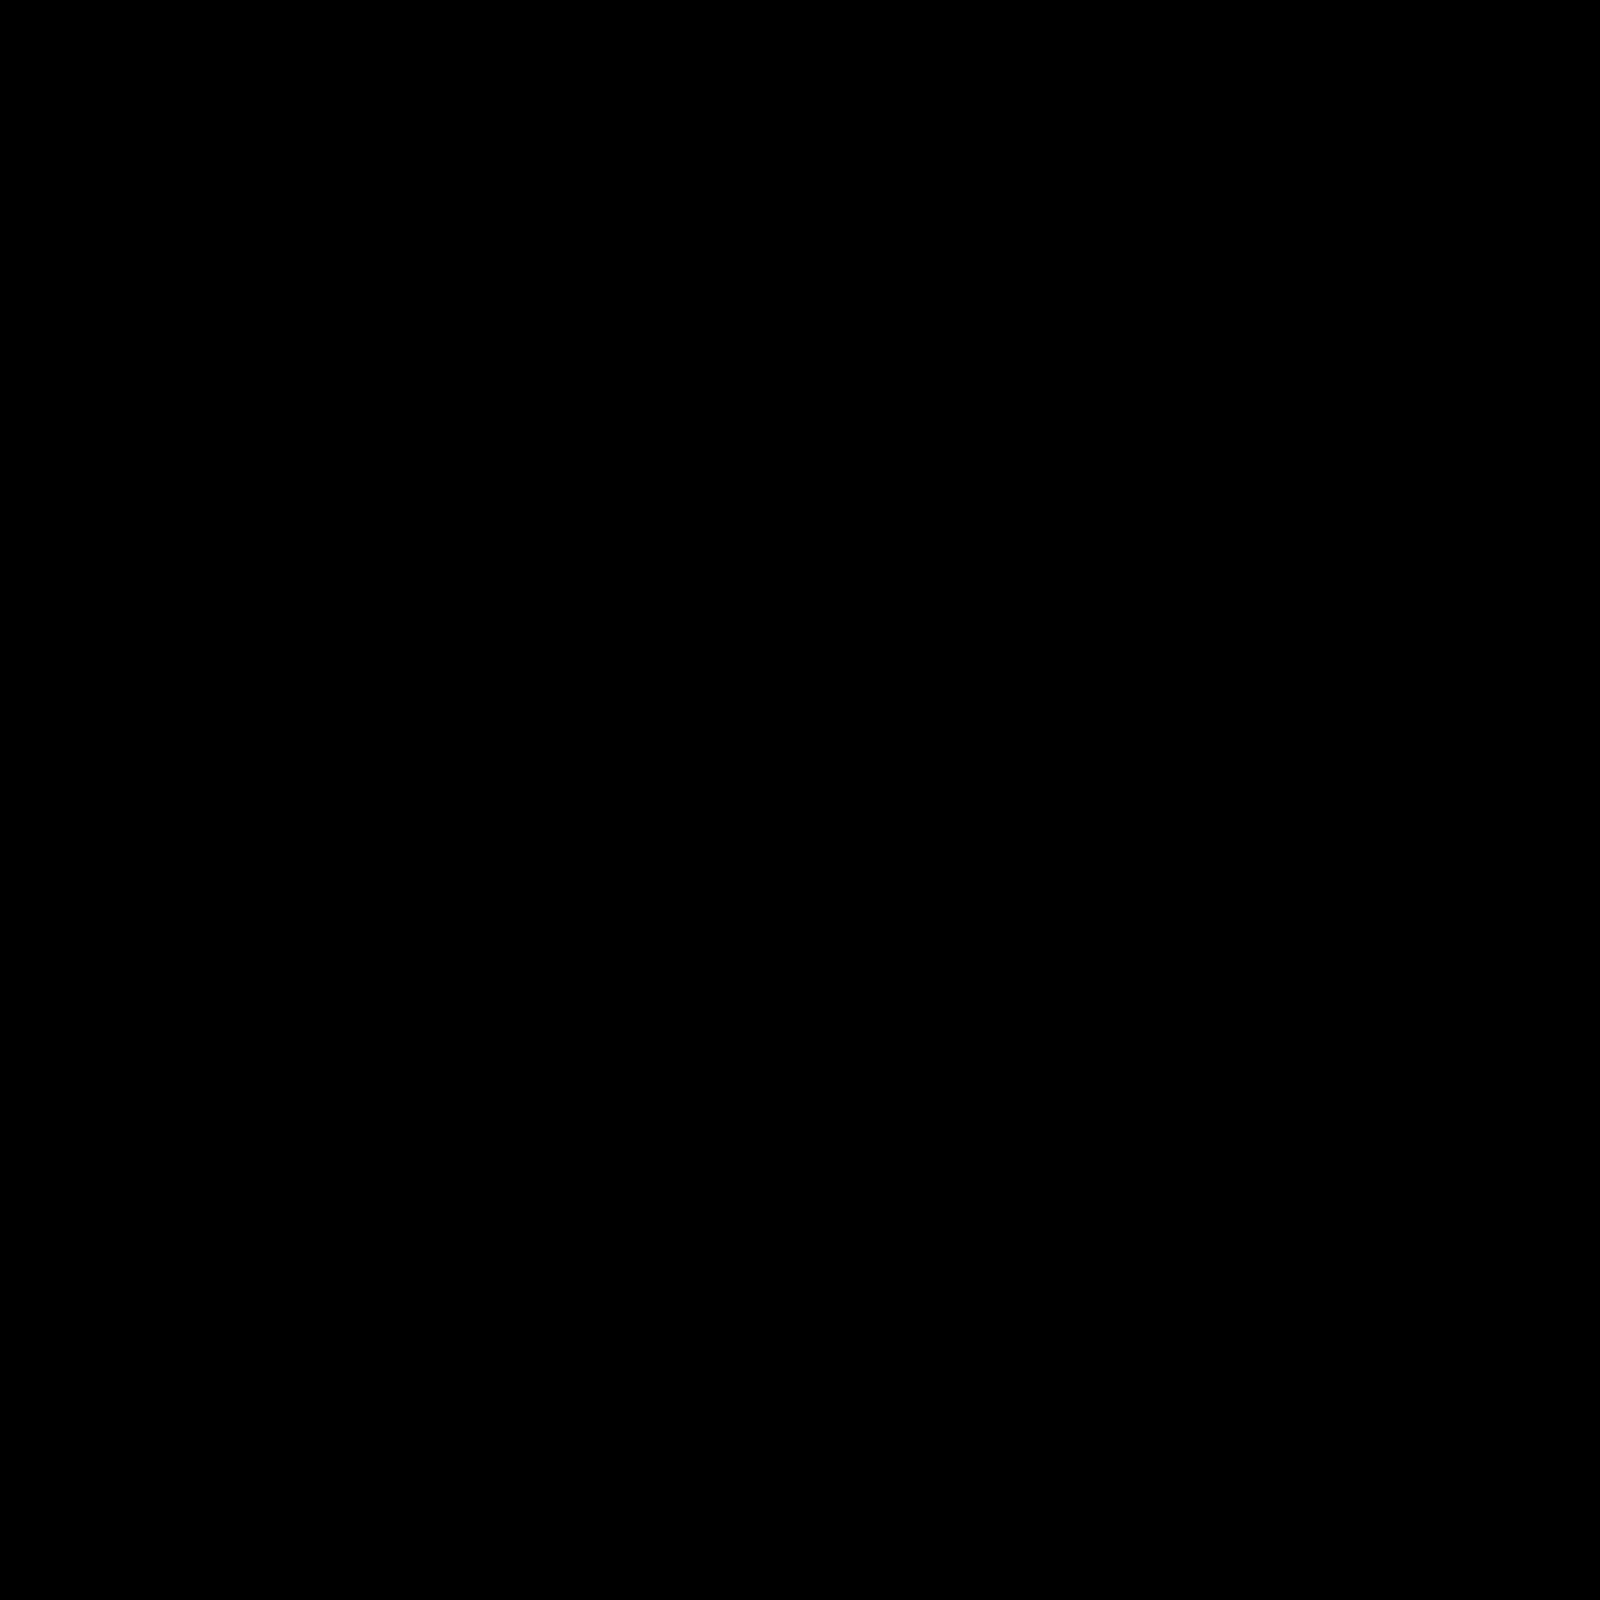 Prawn Filled icon